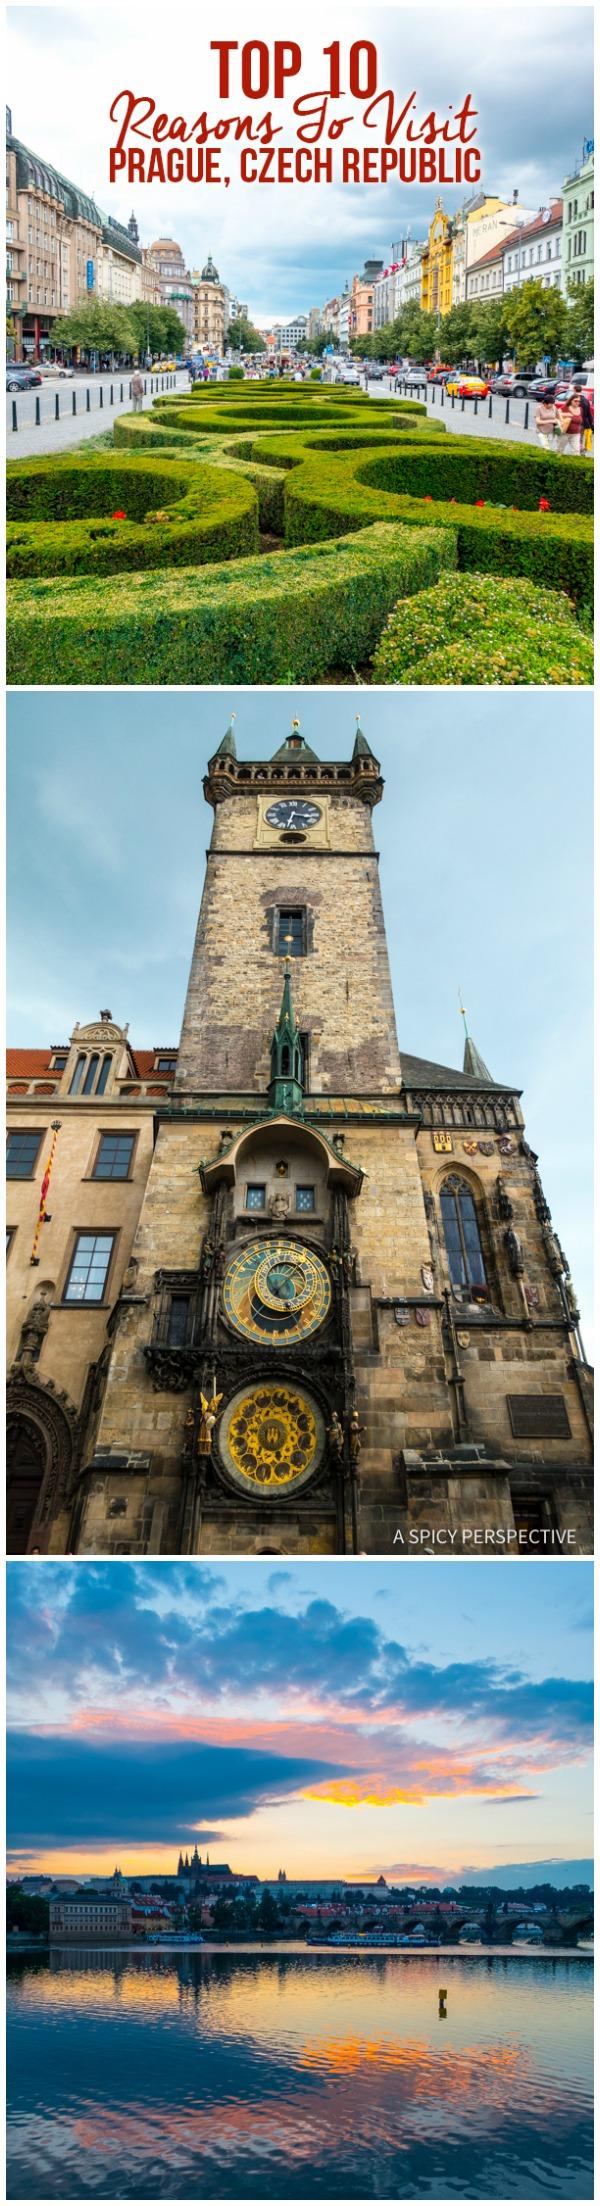 Top 10 Reasons To Visit Prague, Czech Republic #travel #europe